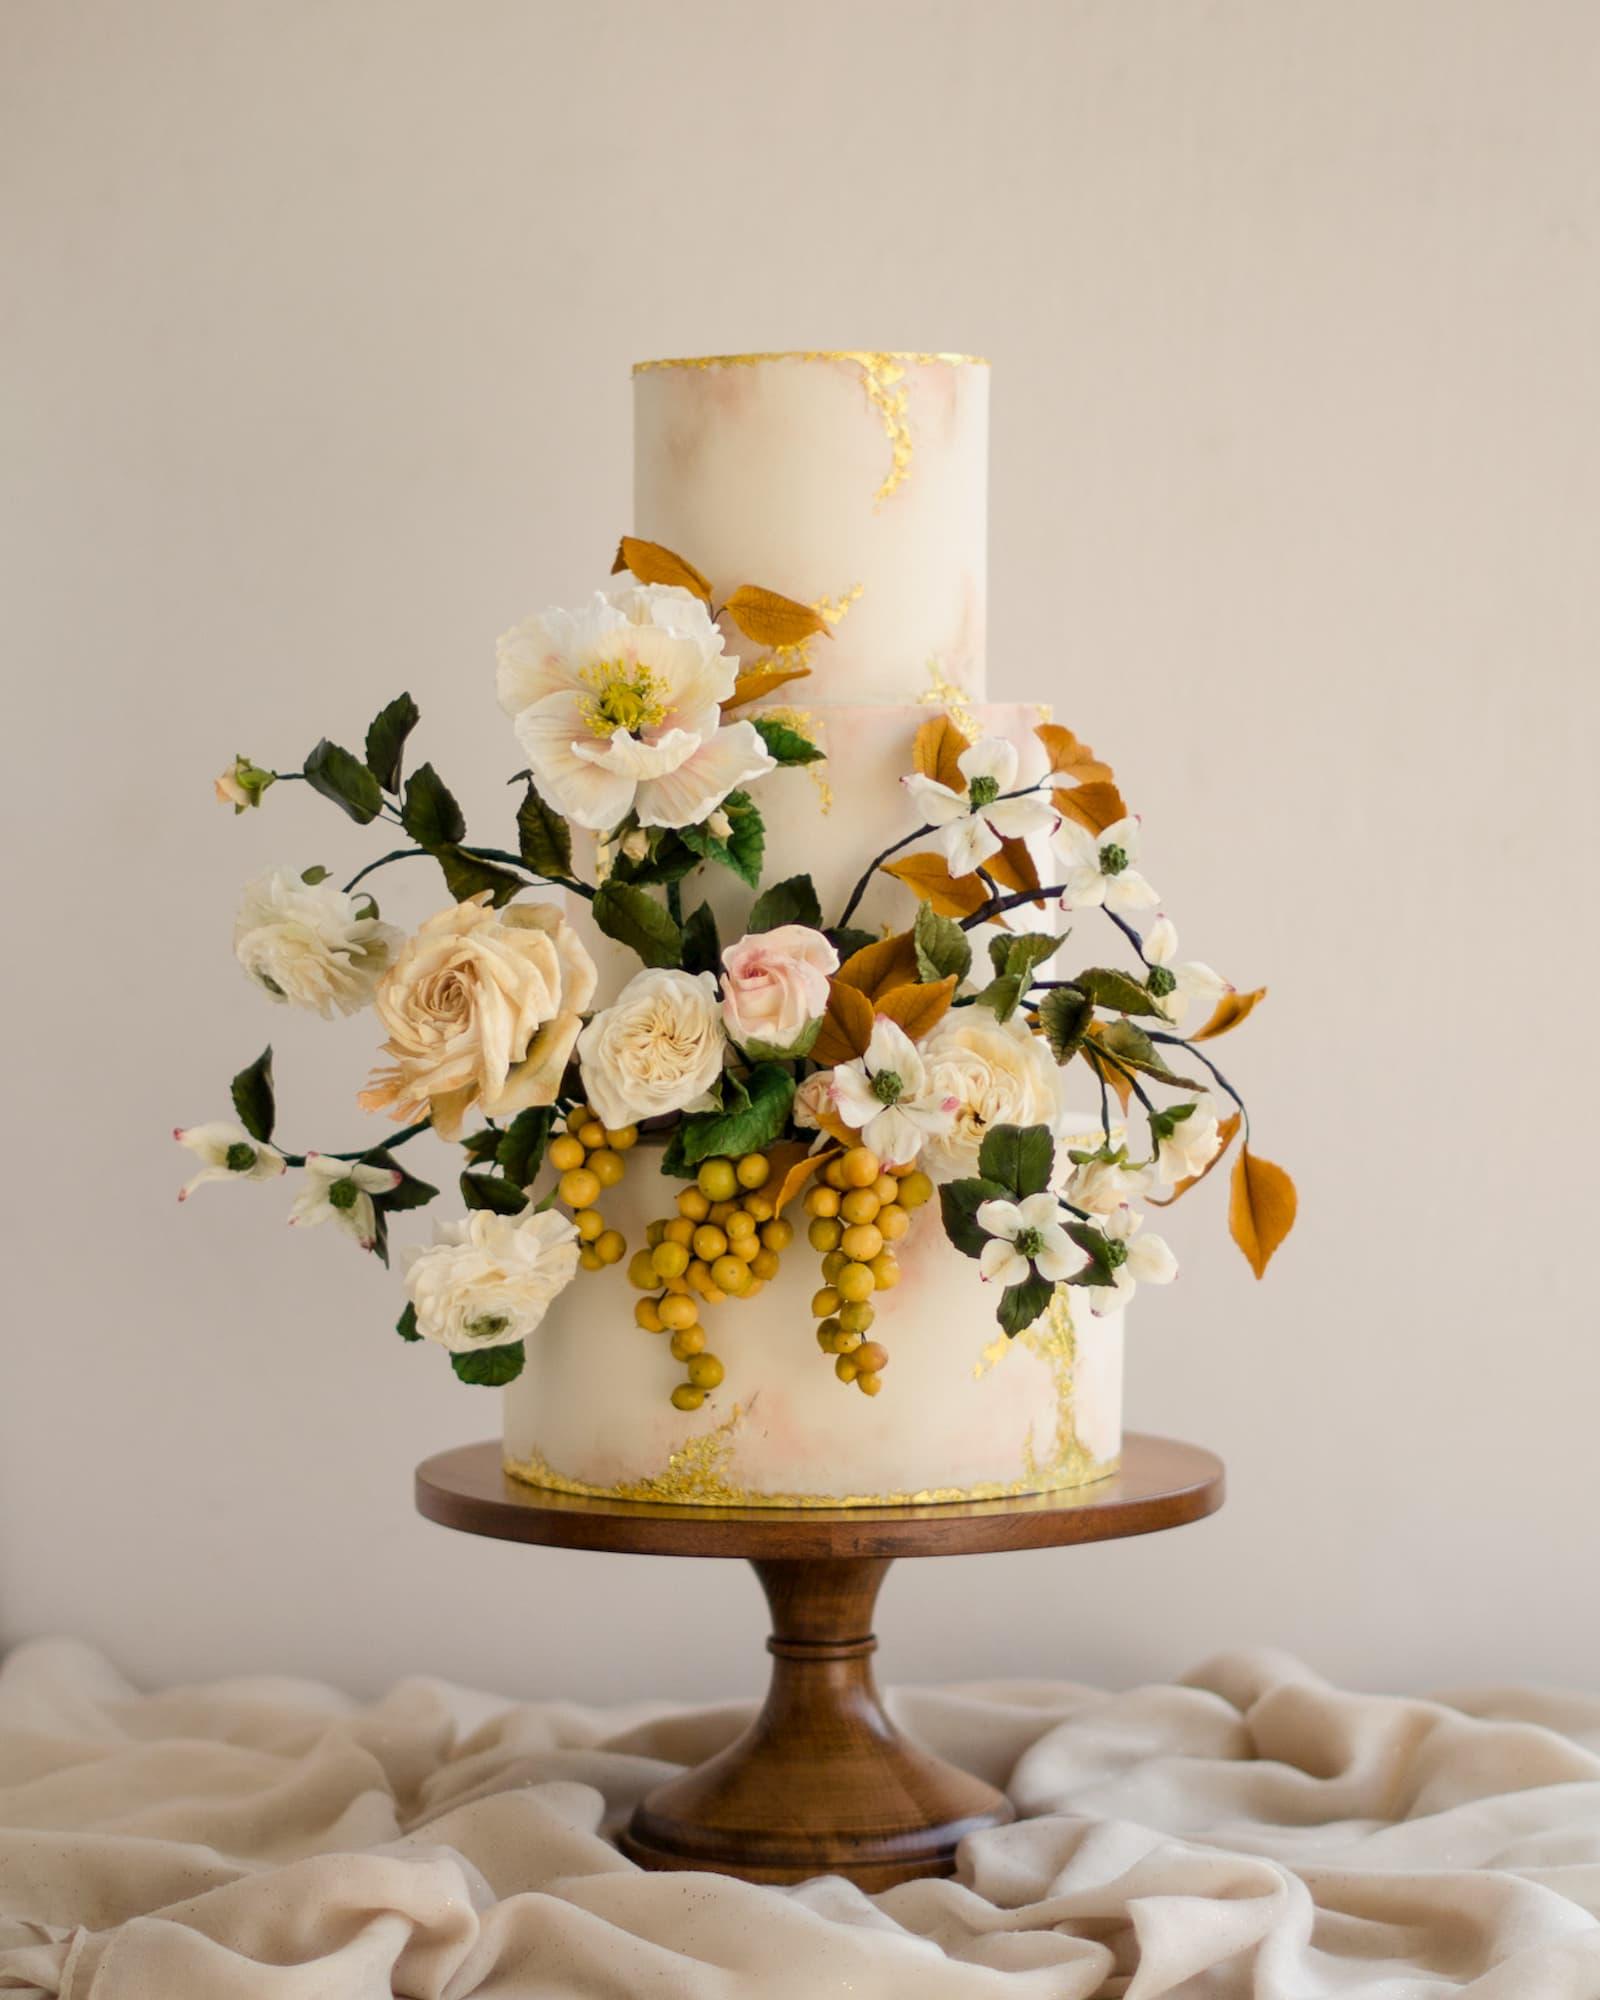 Roseraé Cakes Golden Hour